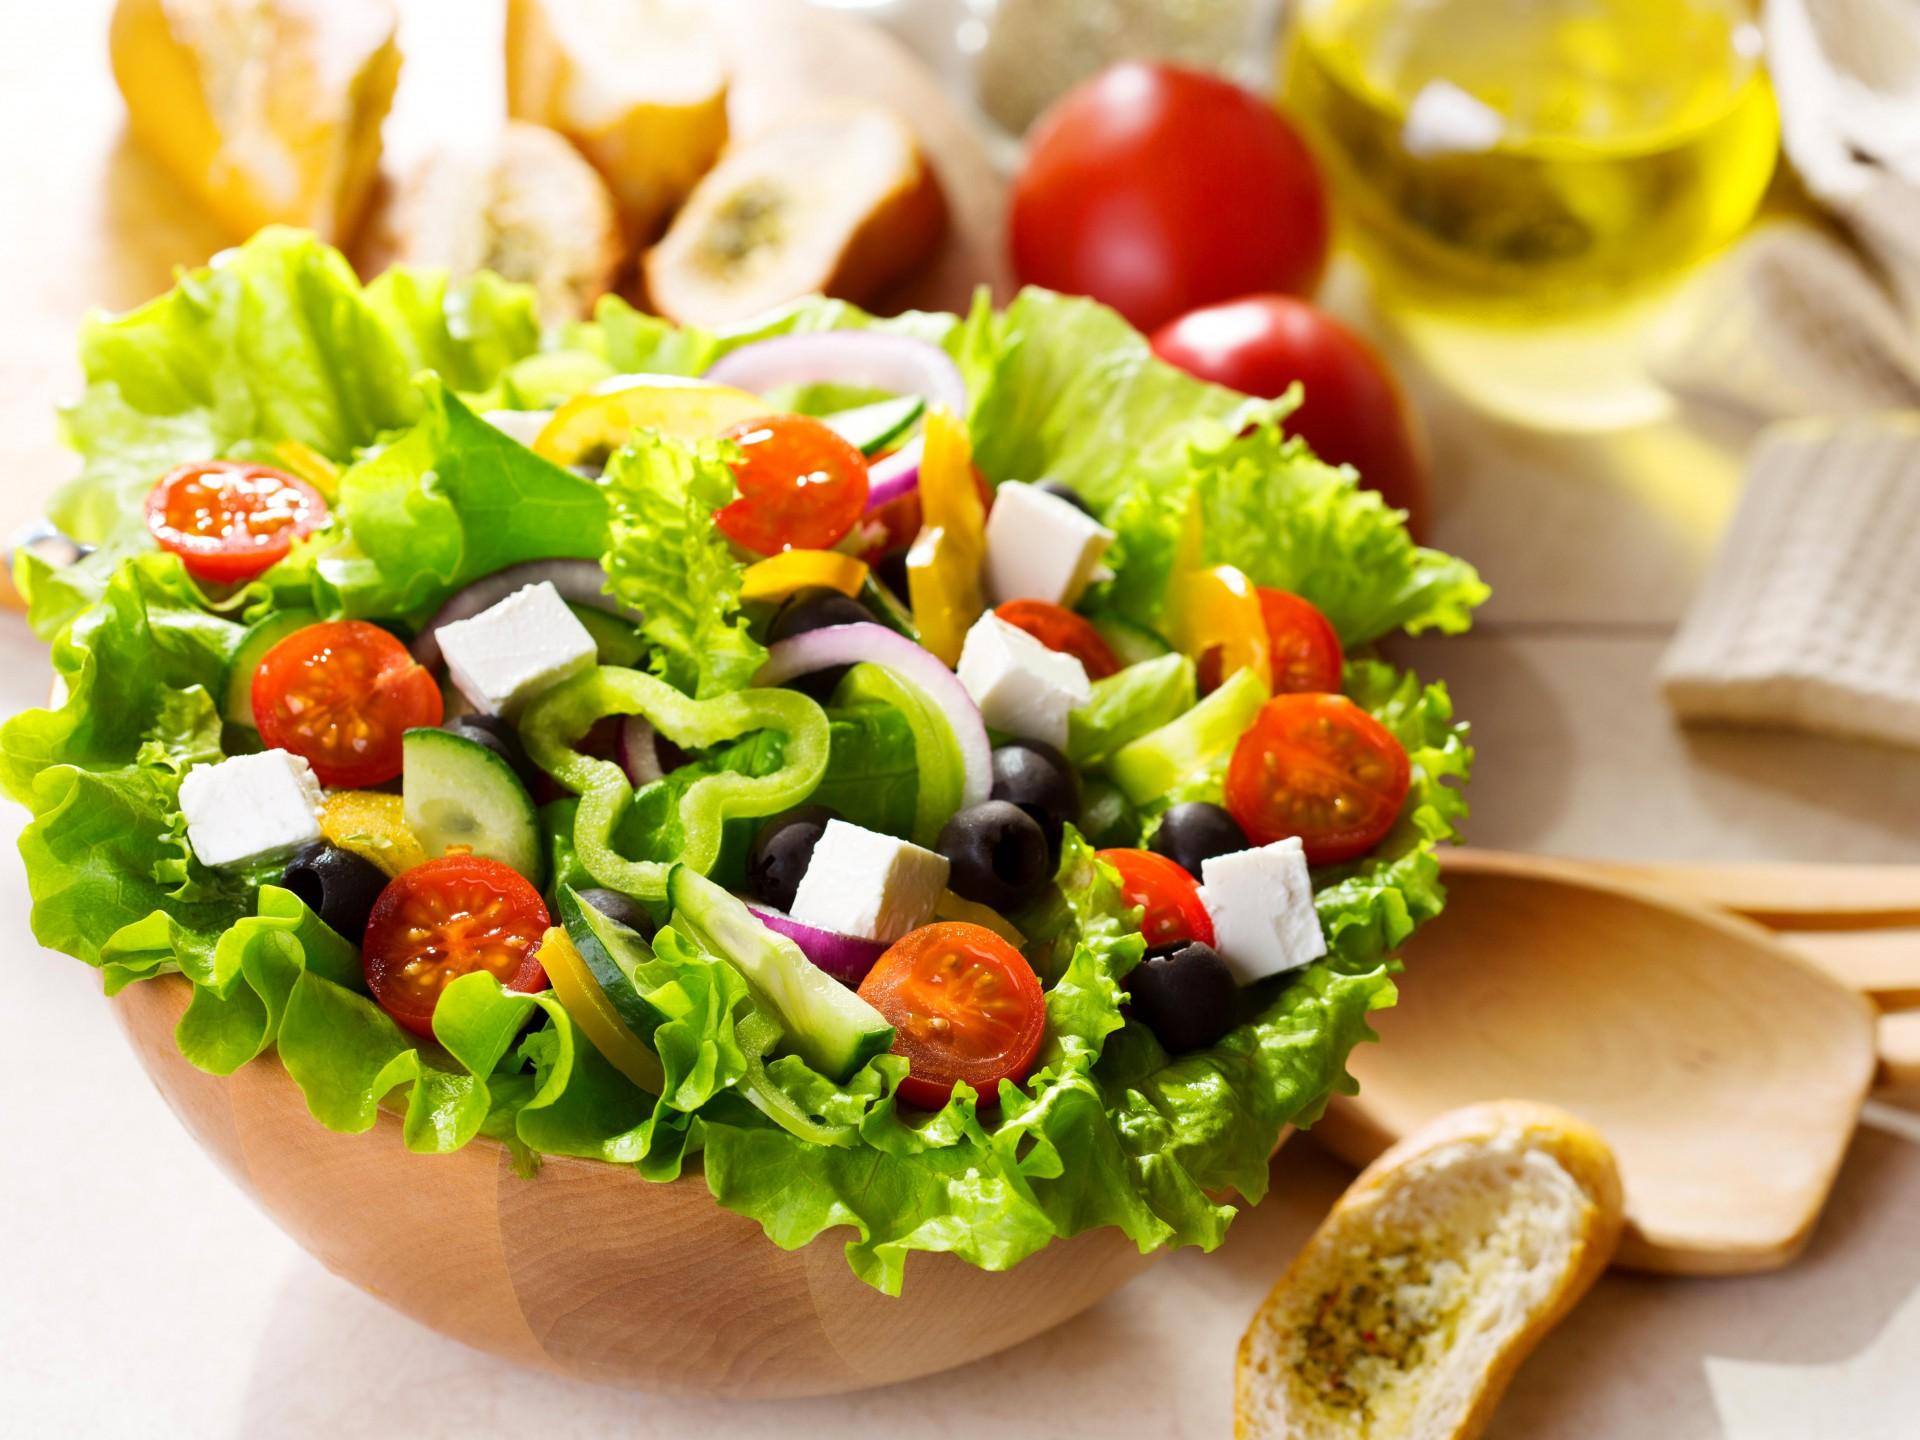 Vegetable Salad Wallpaper